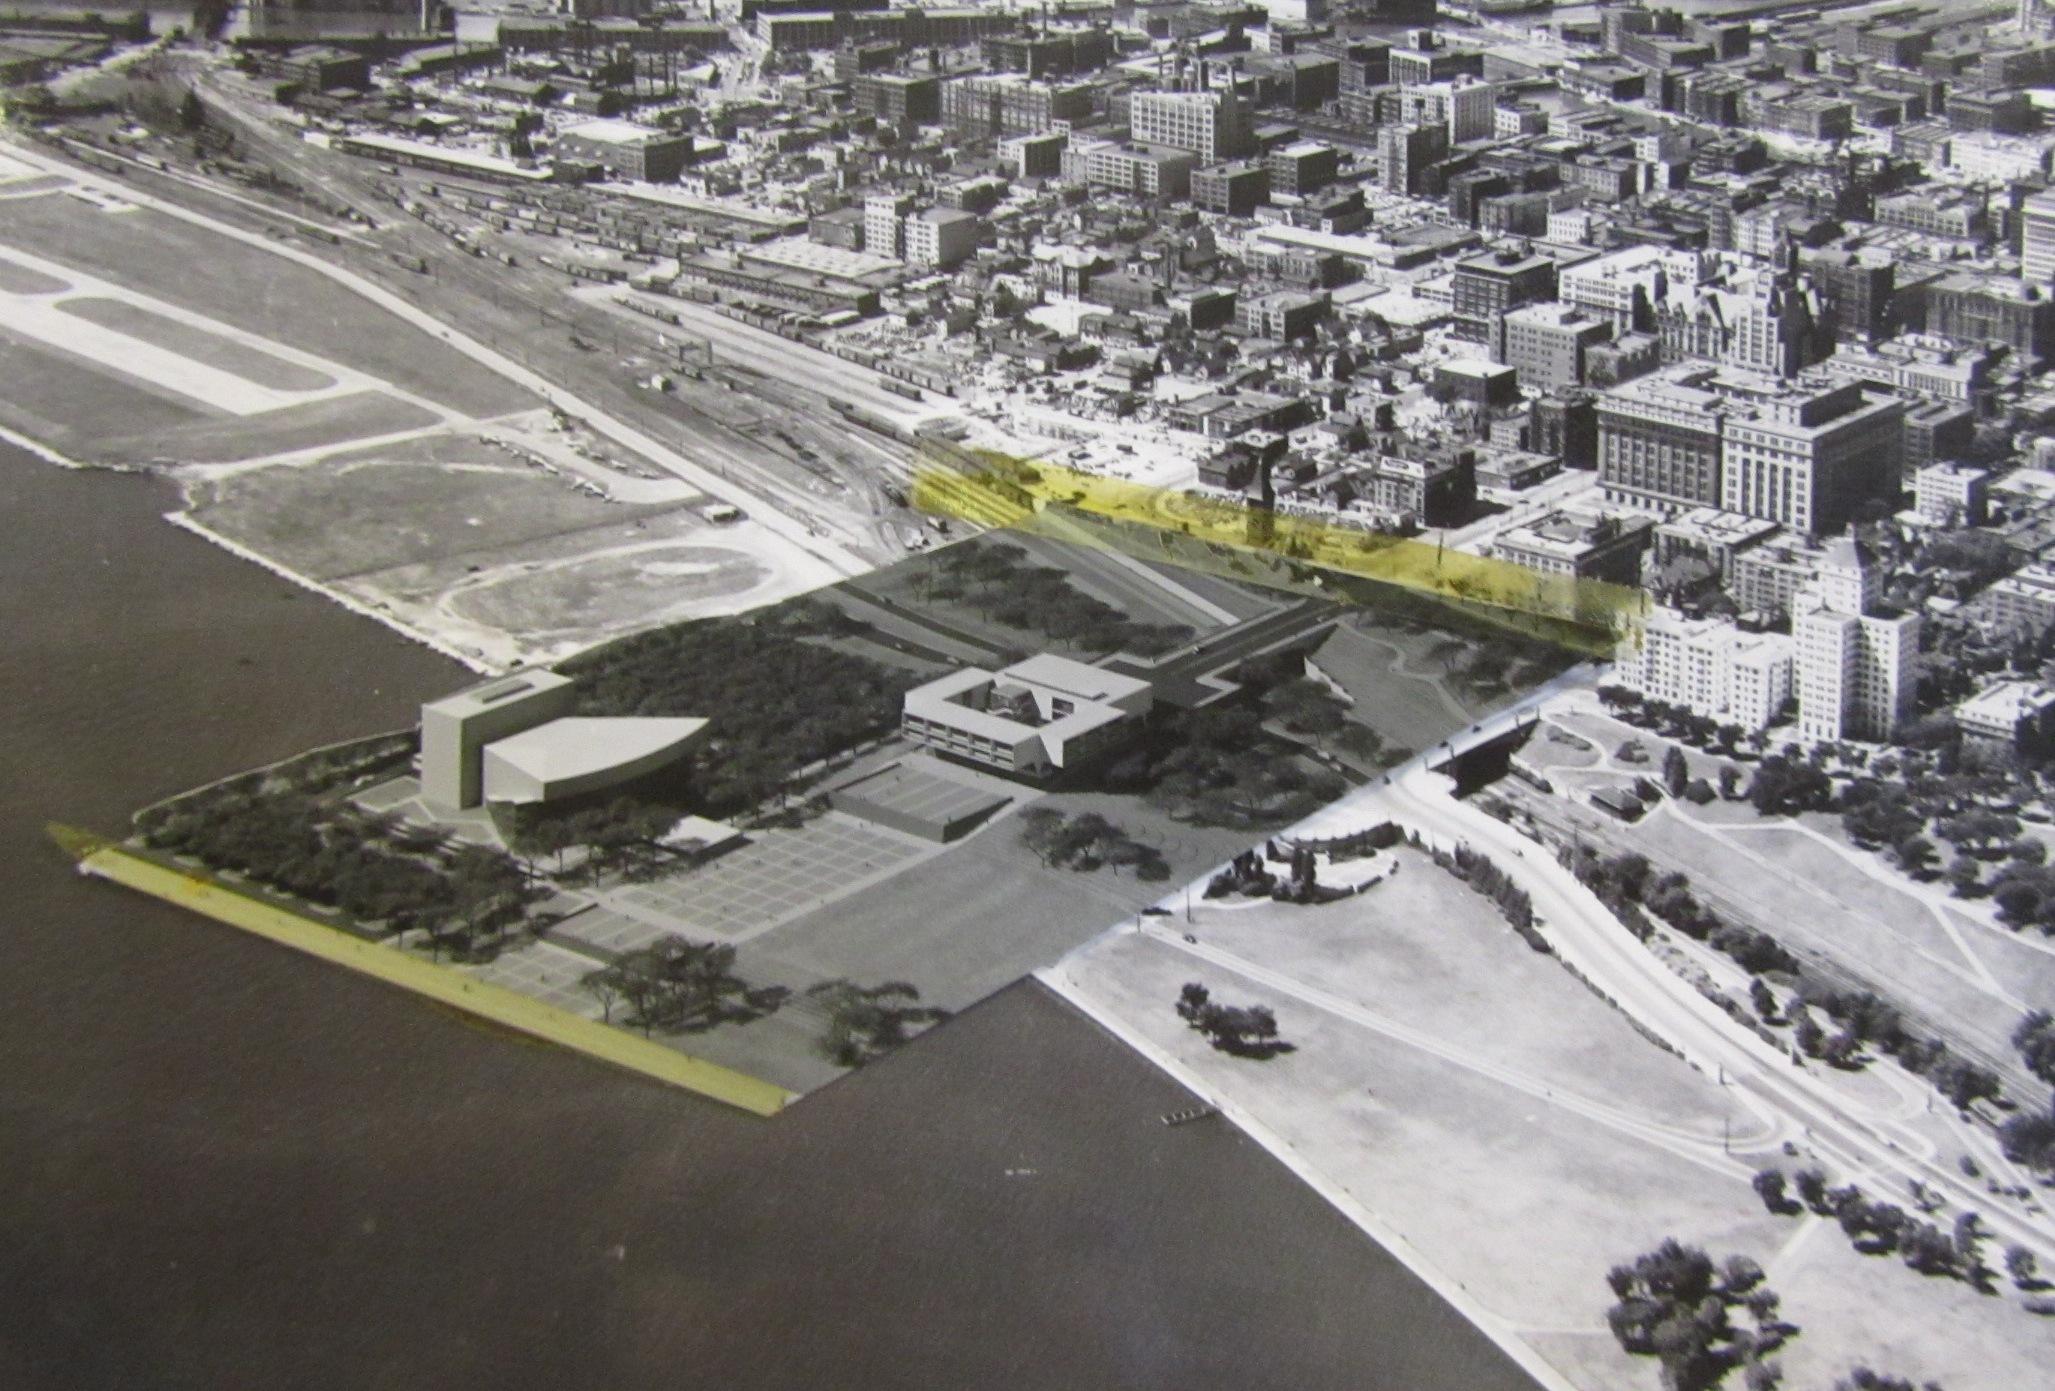 Author's snapshot of Saarinen's War Memorial model taped on a Milwaukee aerial photo. Taken in Eero Saarinen collection, Manuscripts & Archives, Yale University.